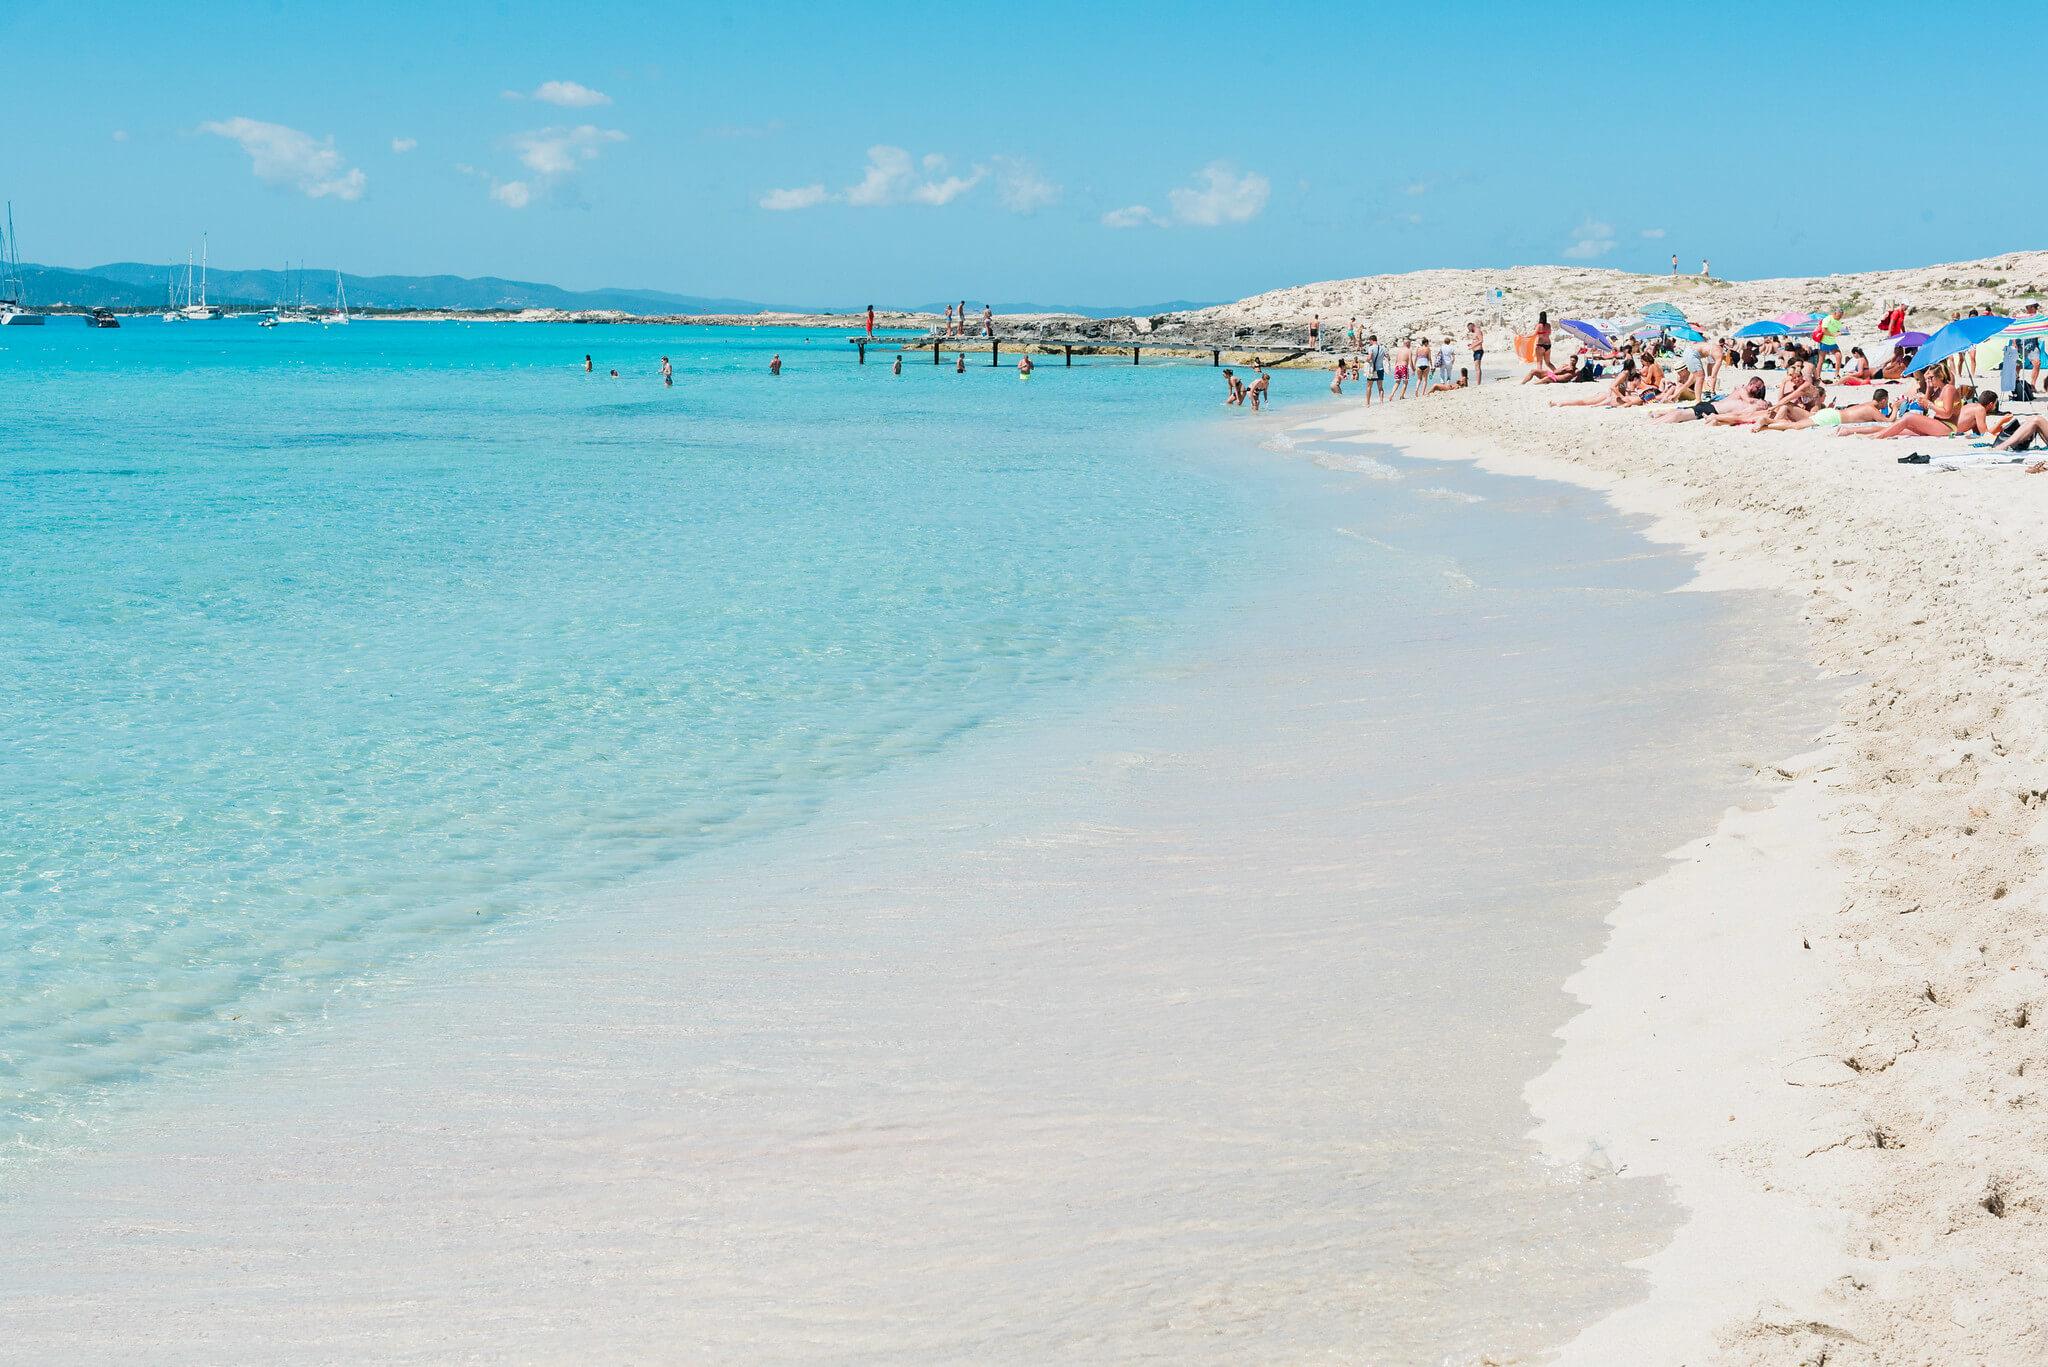 https://www.white-ibiza.com/wp-content/uploads/2020/04/formentera-beaches-illetes-2020-03.jpg